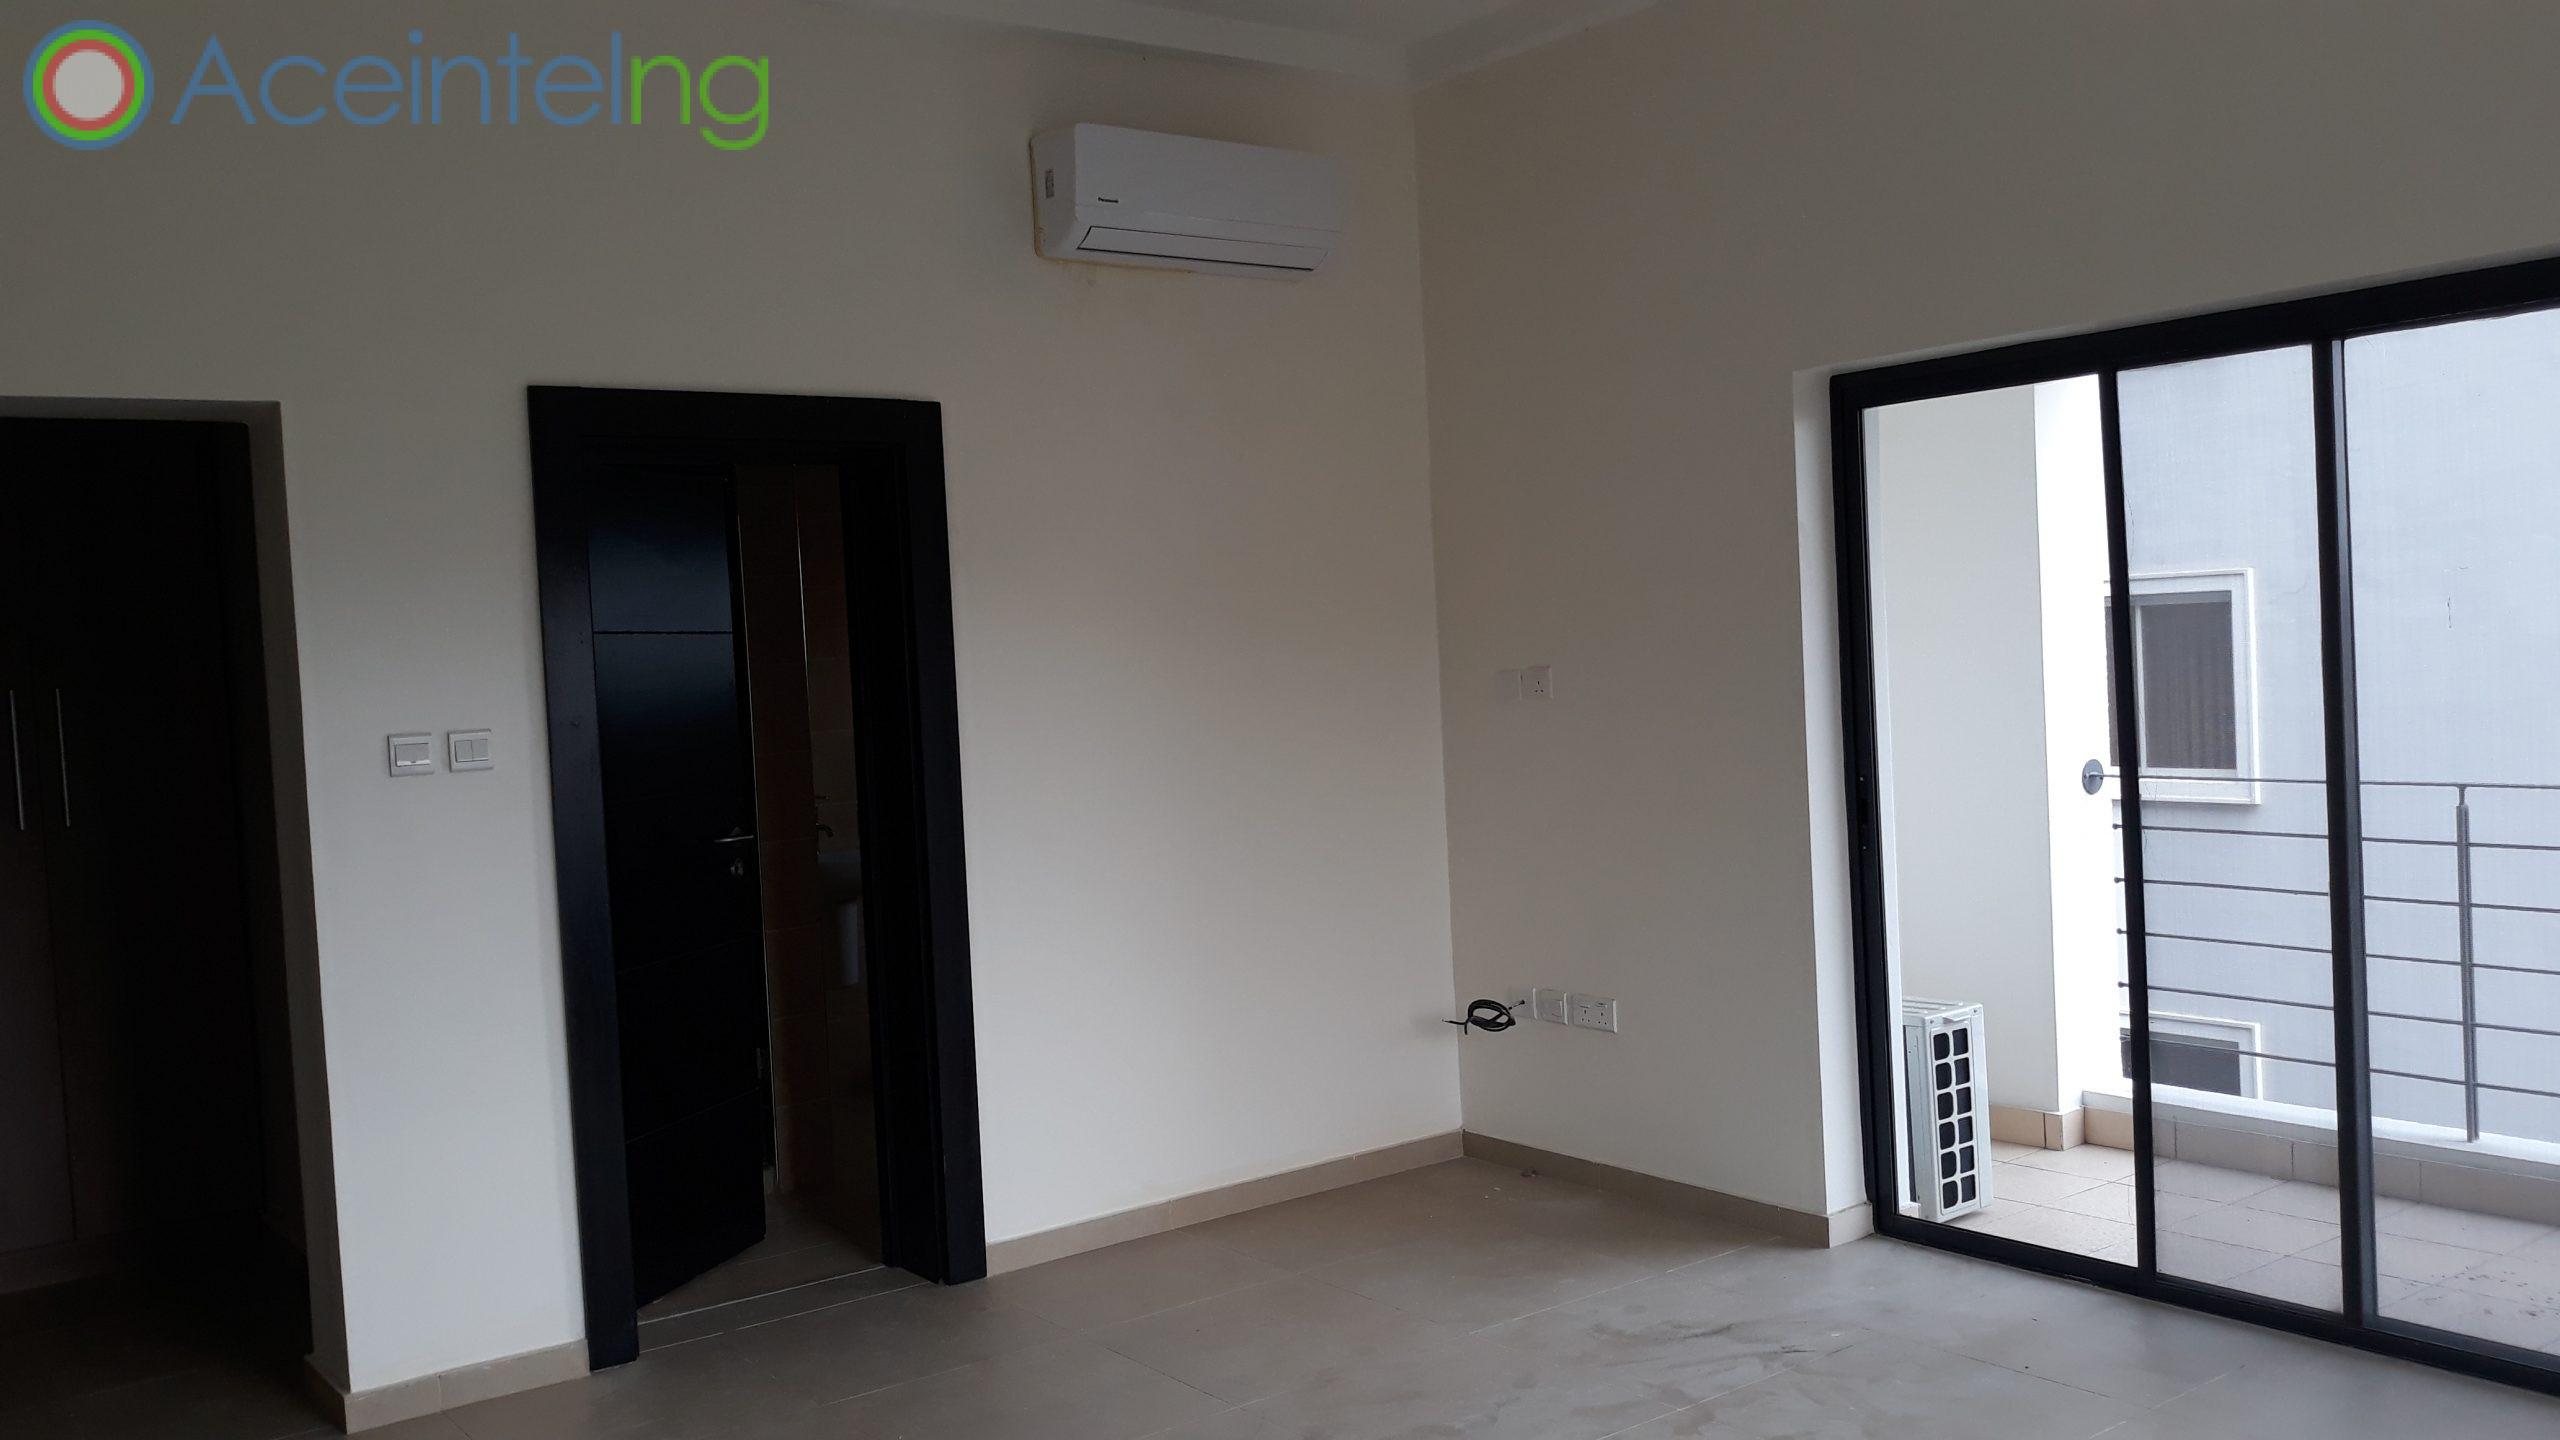 3 Bedroom Flat For Sale In Ikoyi Lagos Aceintelng